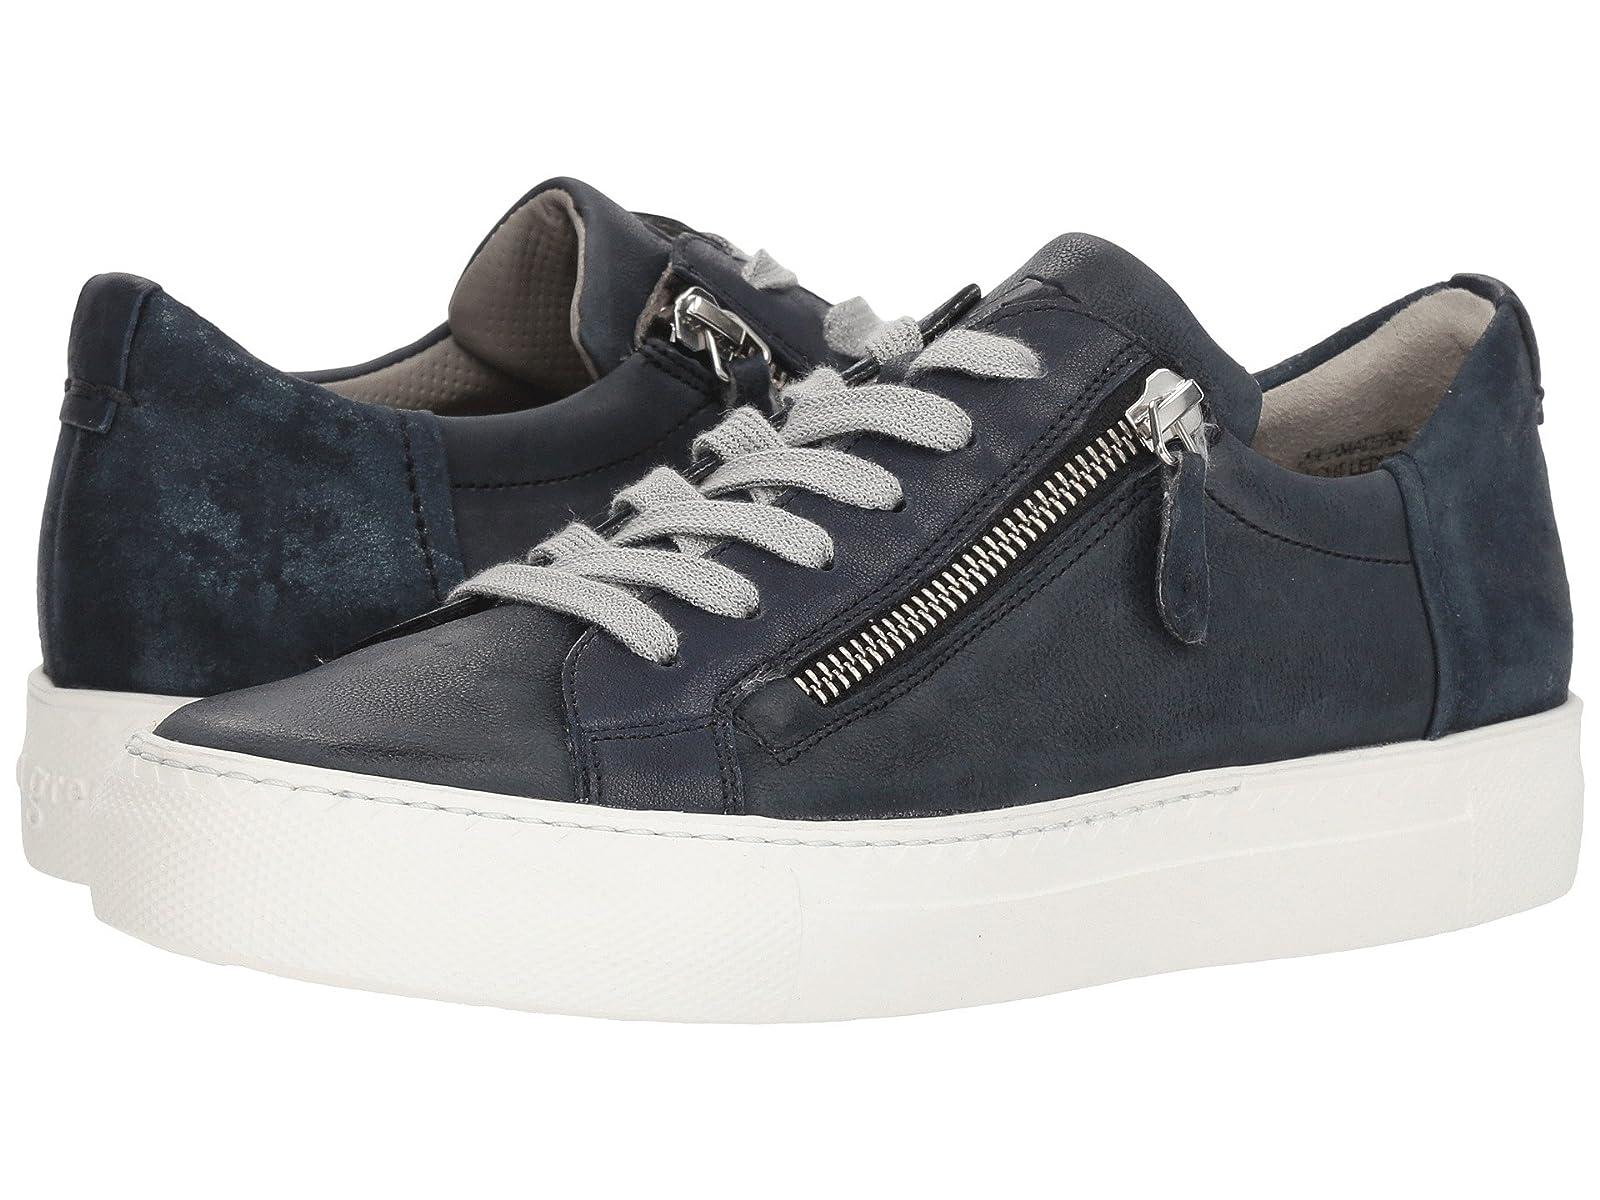 Paul Green OrleansAtmospheric grades have affordable shoes